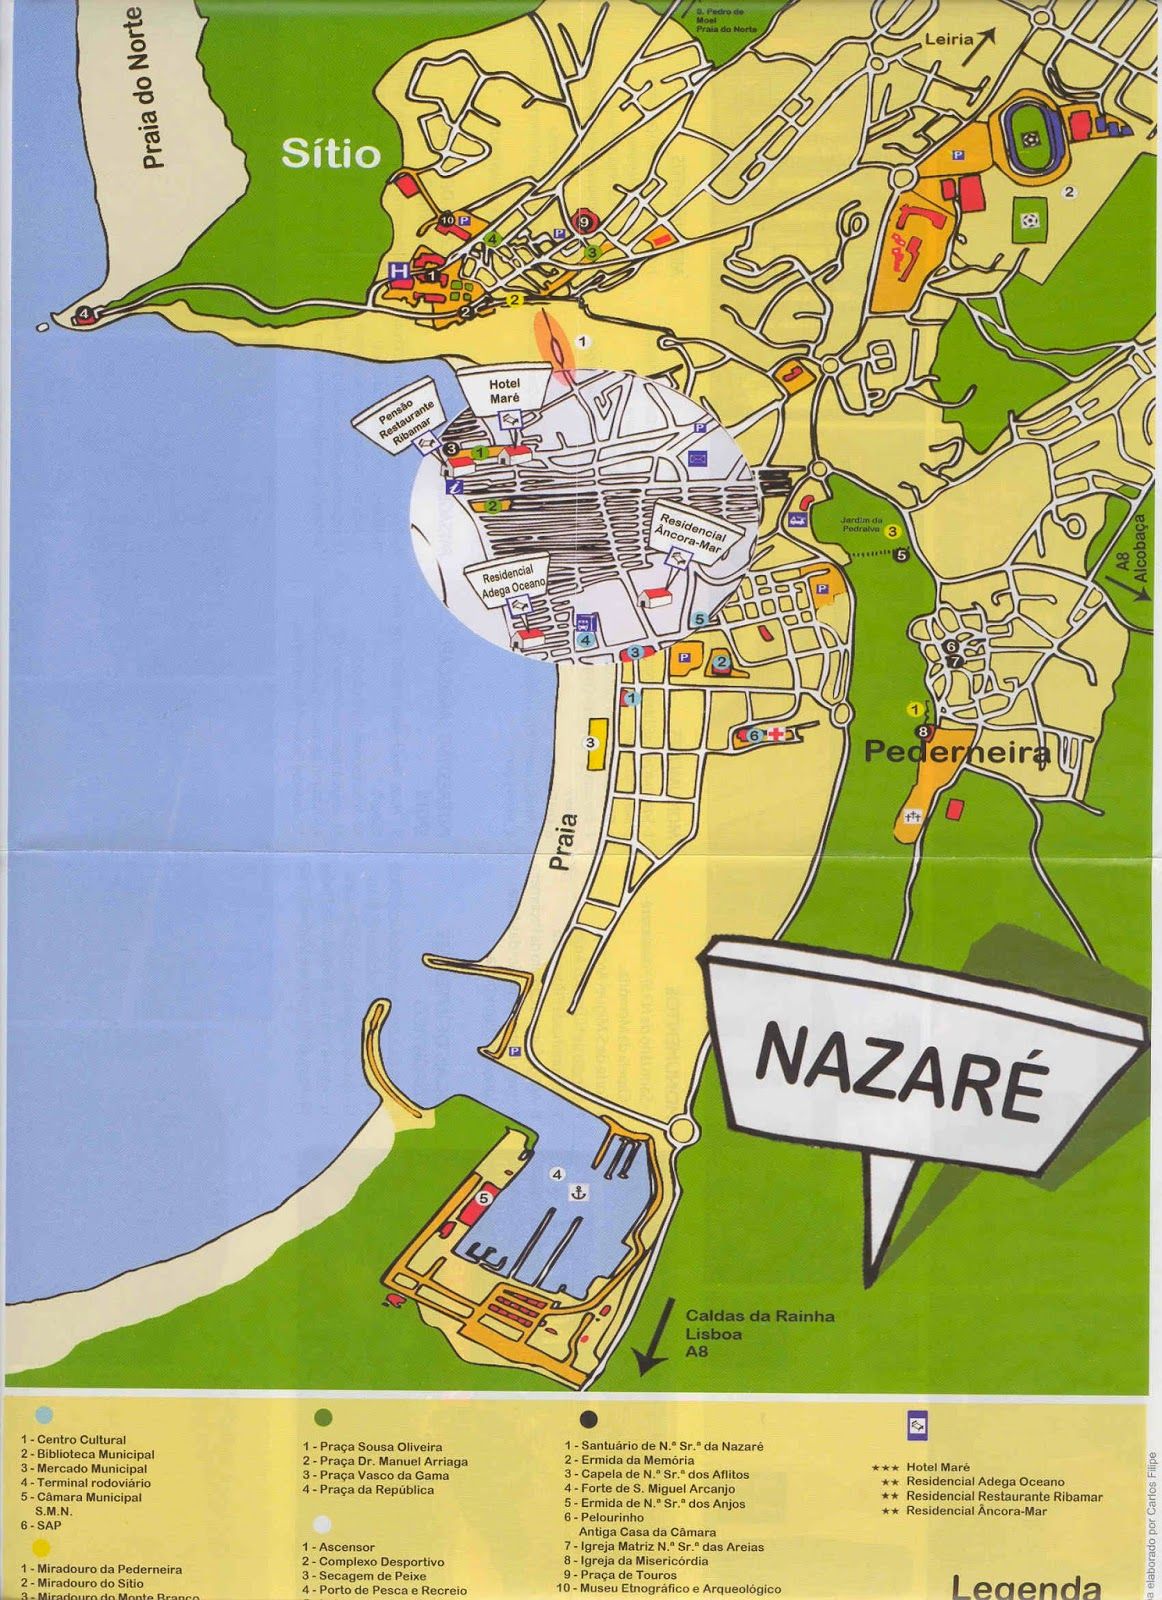 mapa de portugal nazare Mapas de Nazaré   Portugal | MapasBlog mapa de portugal nazare